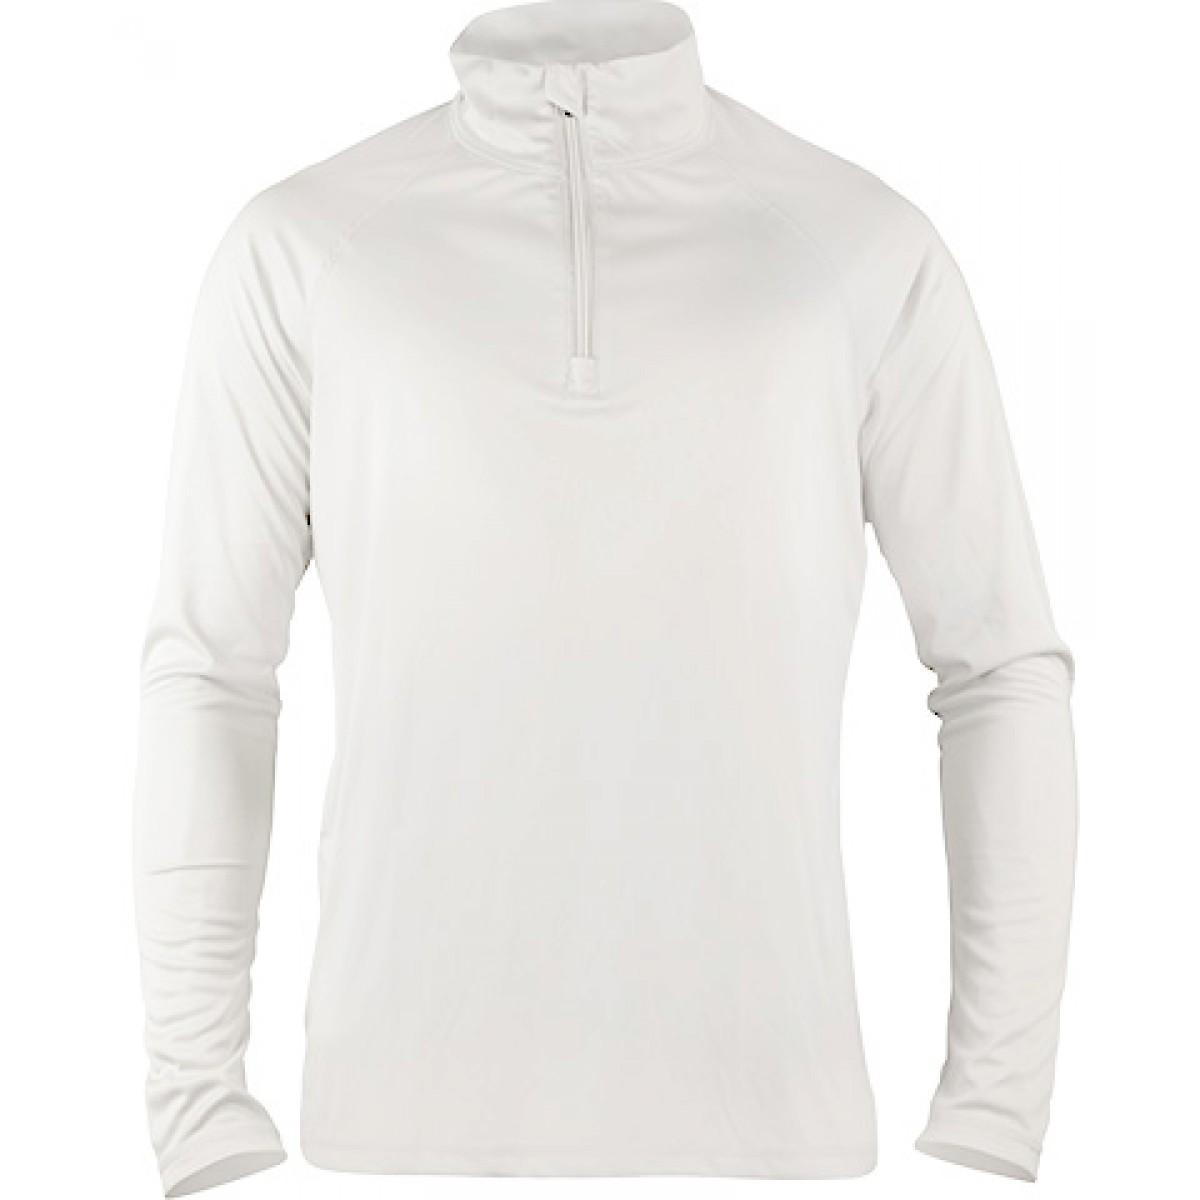 Quarter-Zip Lightweight Pullover-White-YS